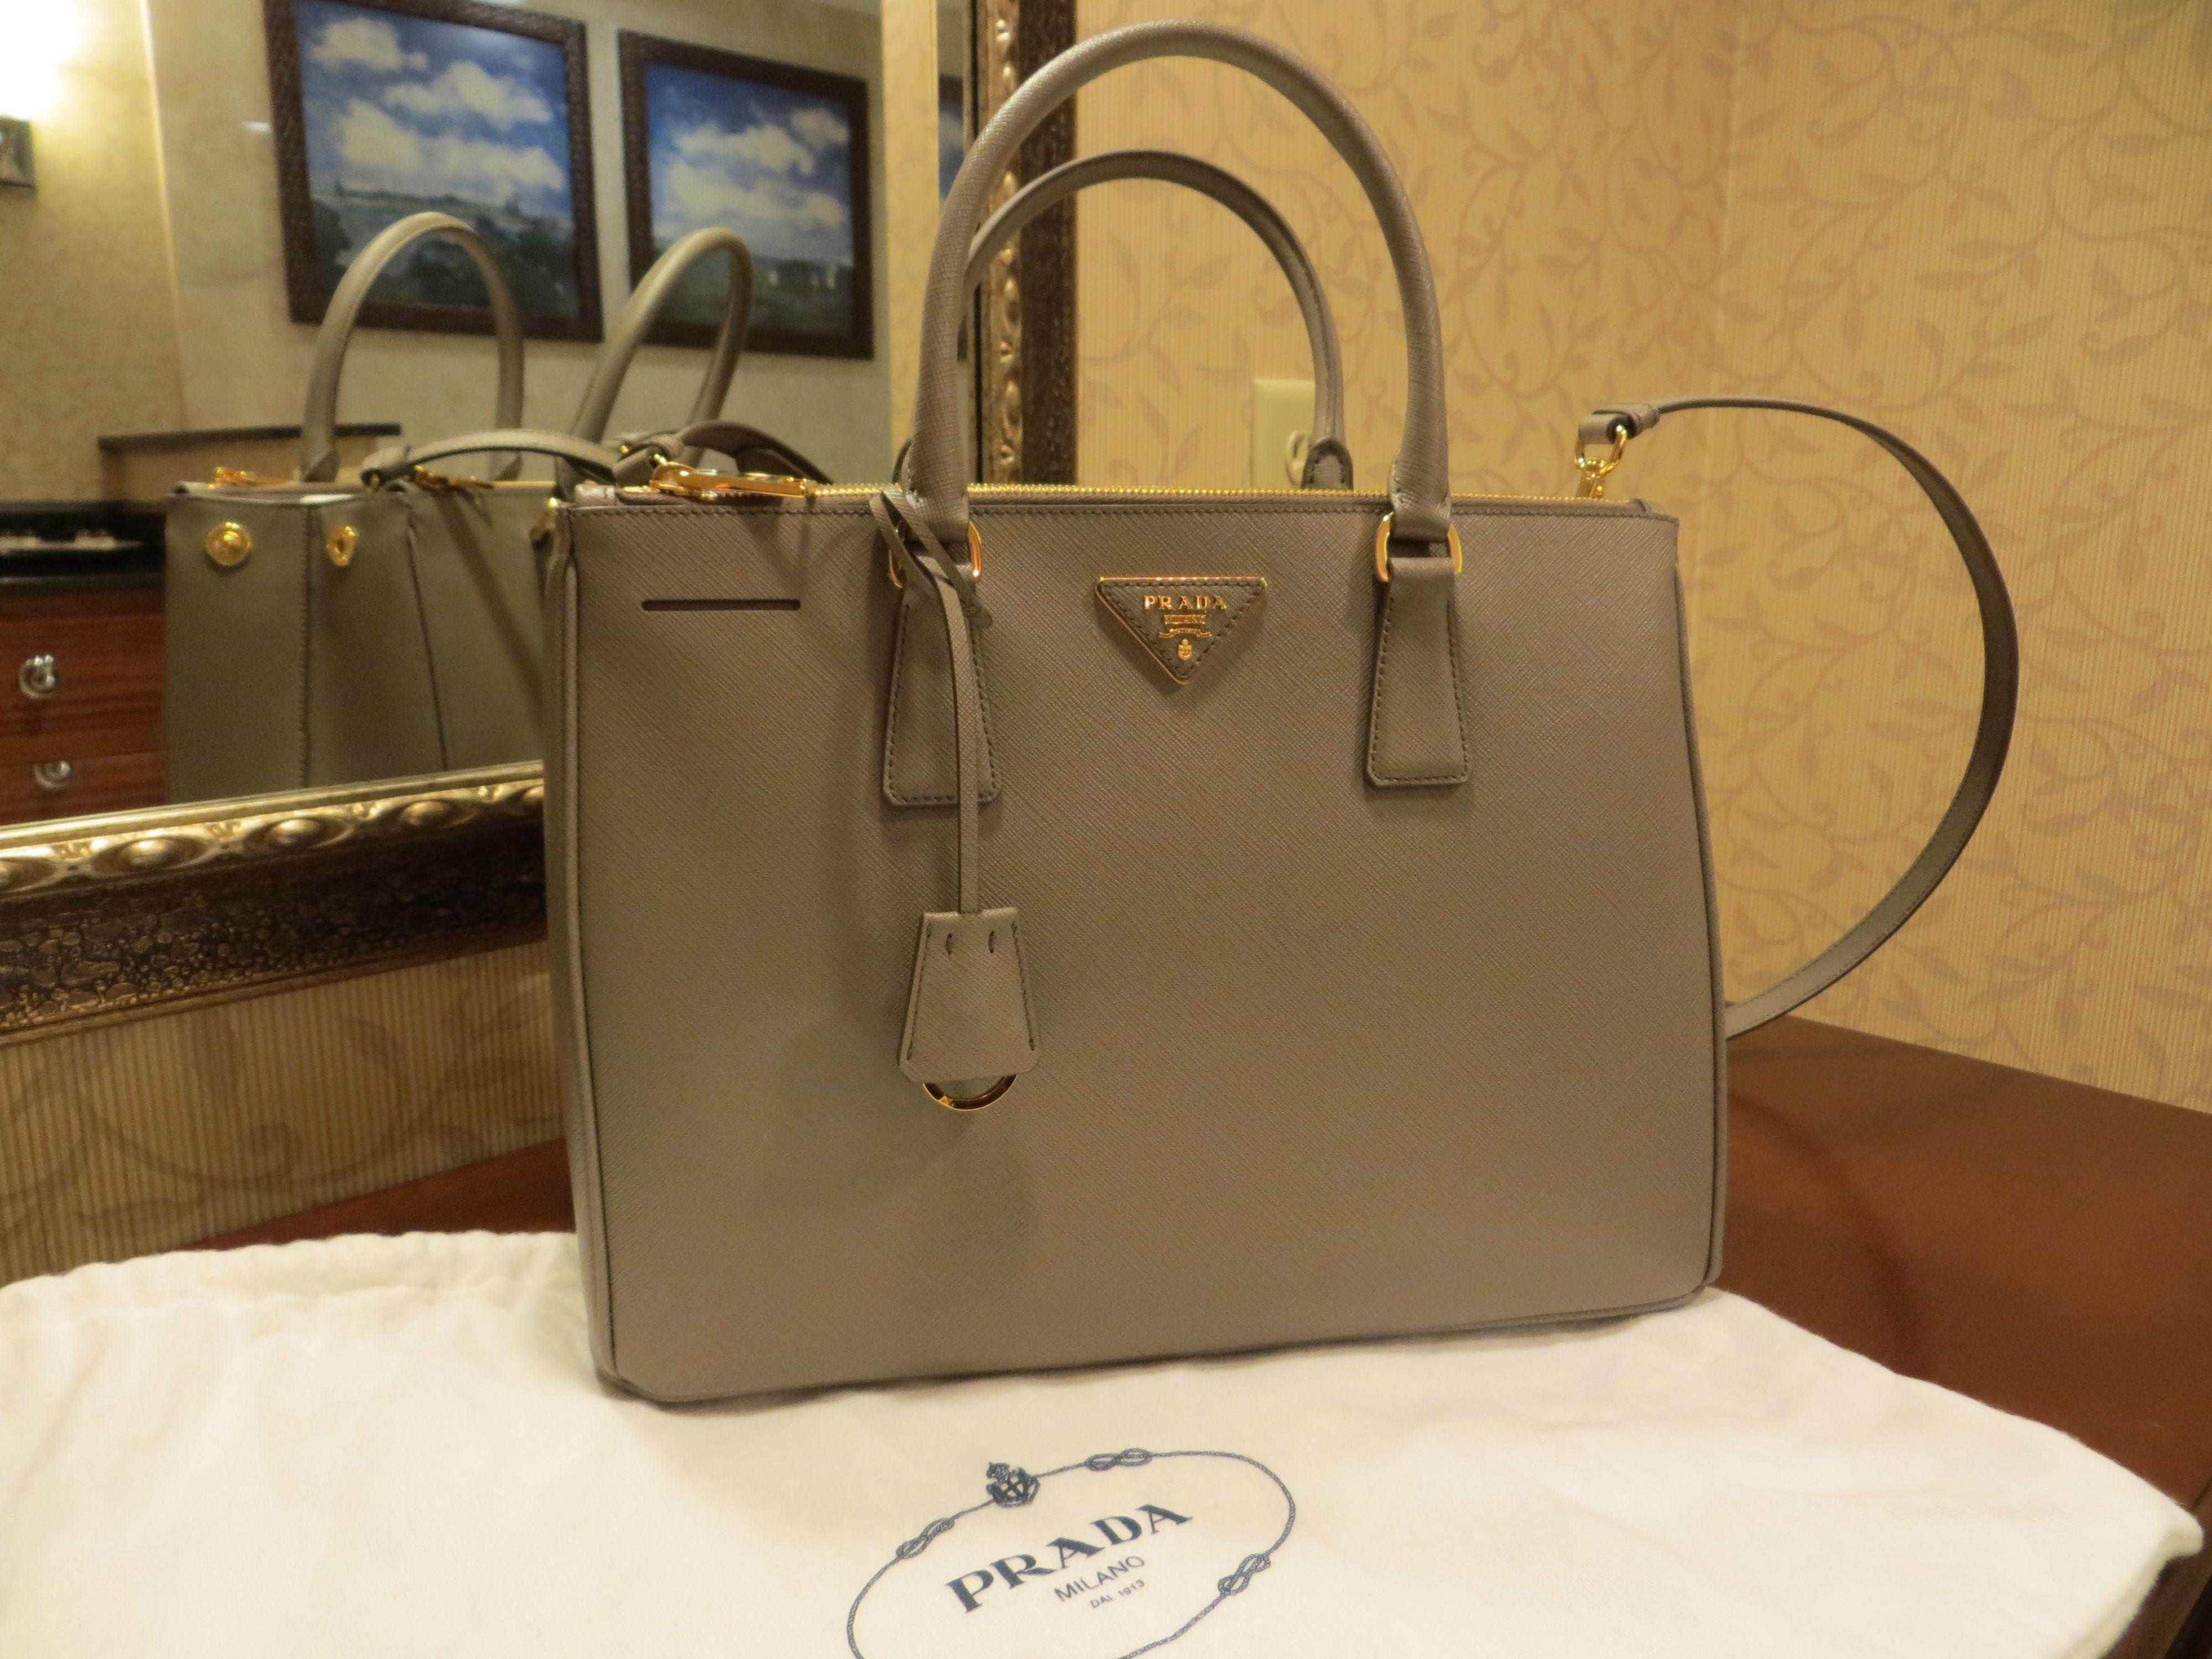 daa74aa4c680 Prada Saffiano Double Zip / Lux Tote Bag in Argilla Grey   My Style ...